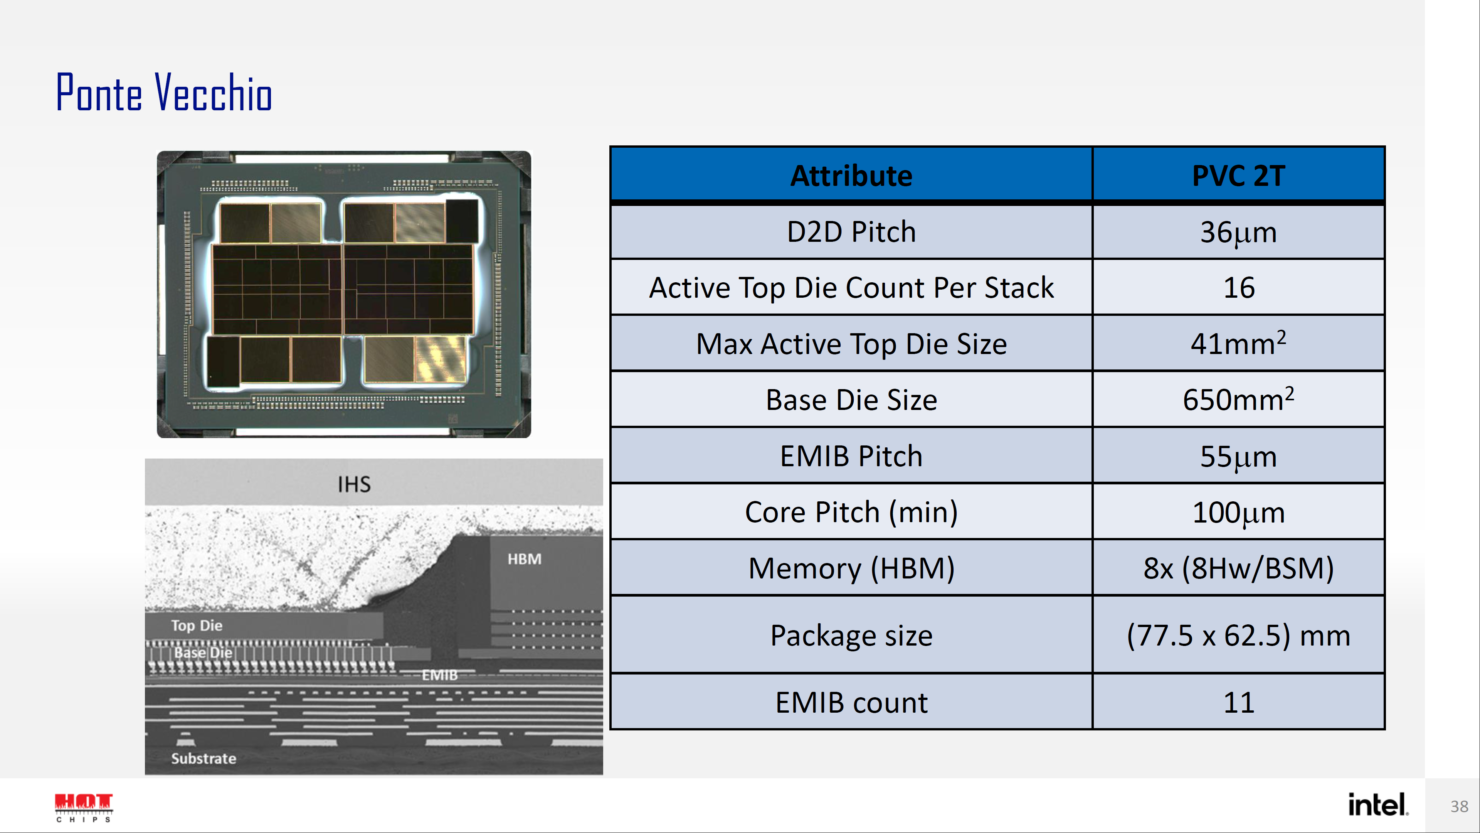 intel-sapphire-rapids-sp-xeon-hbm-cpu-ponte-vecchio-gpu-with-emib-forveros-packaging-technologies-_8